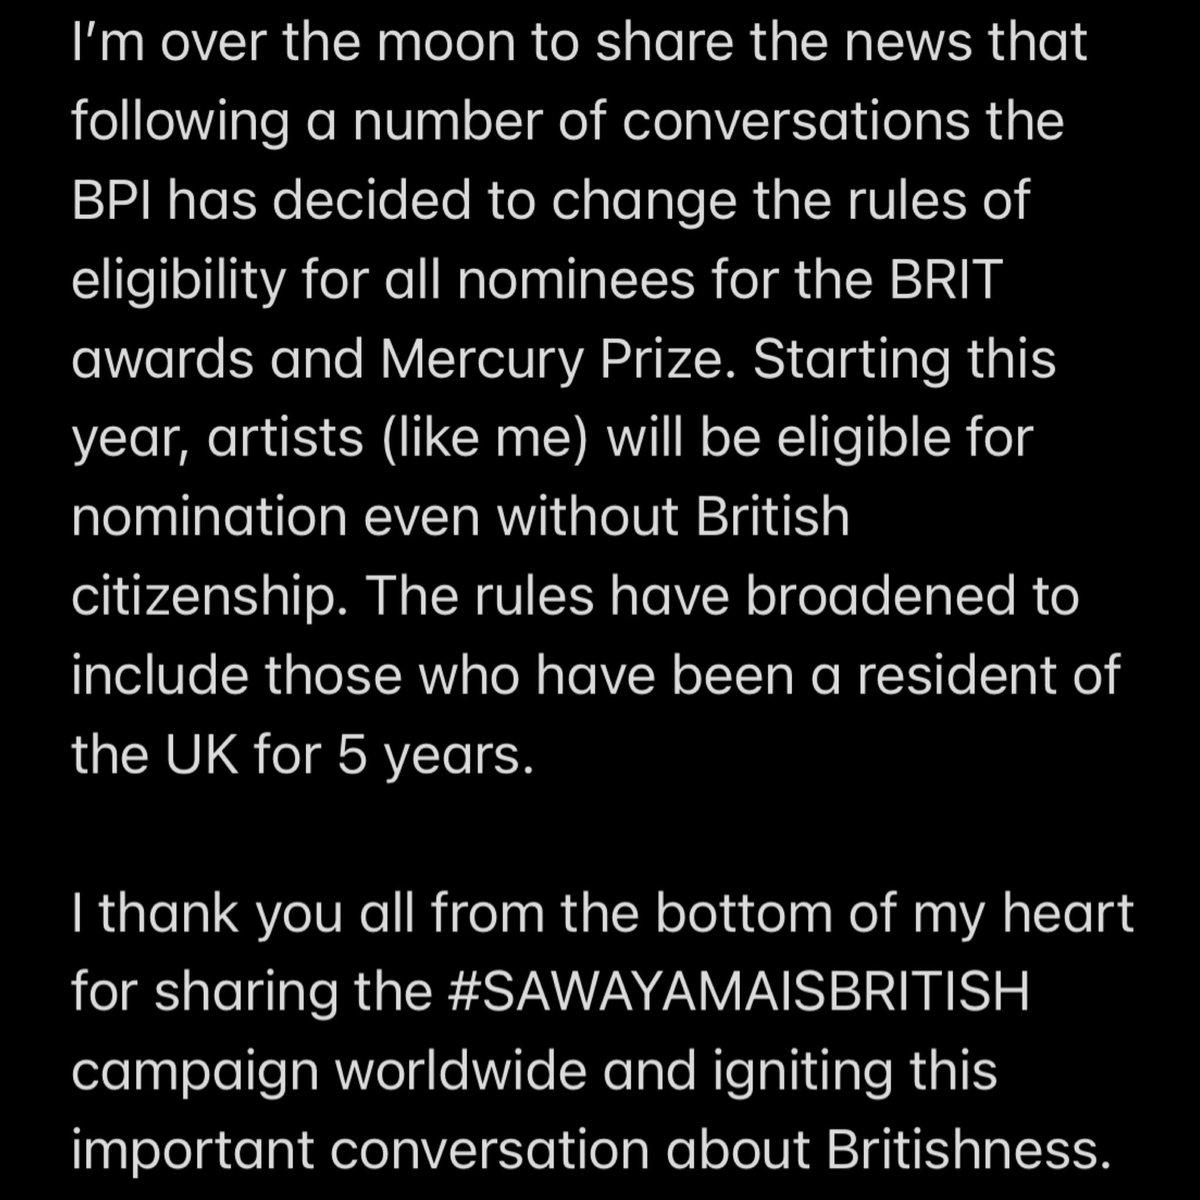 Replying to @rinasawayama: REDEFINING BRITISHNESS !!!! shoutout @bpi_music !!!! #SAWAYAMAISBRITISH !!